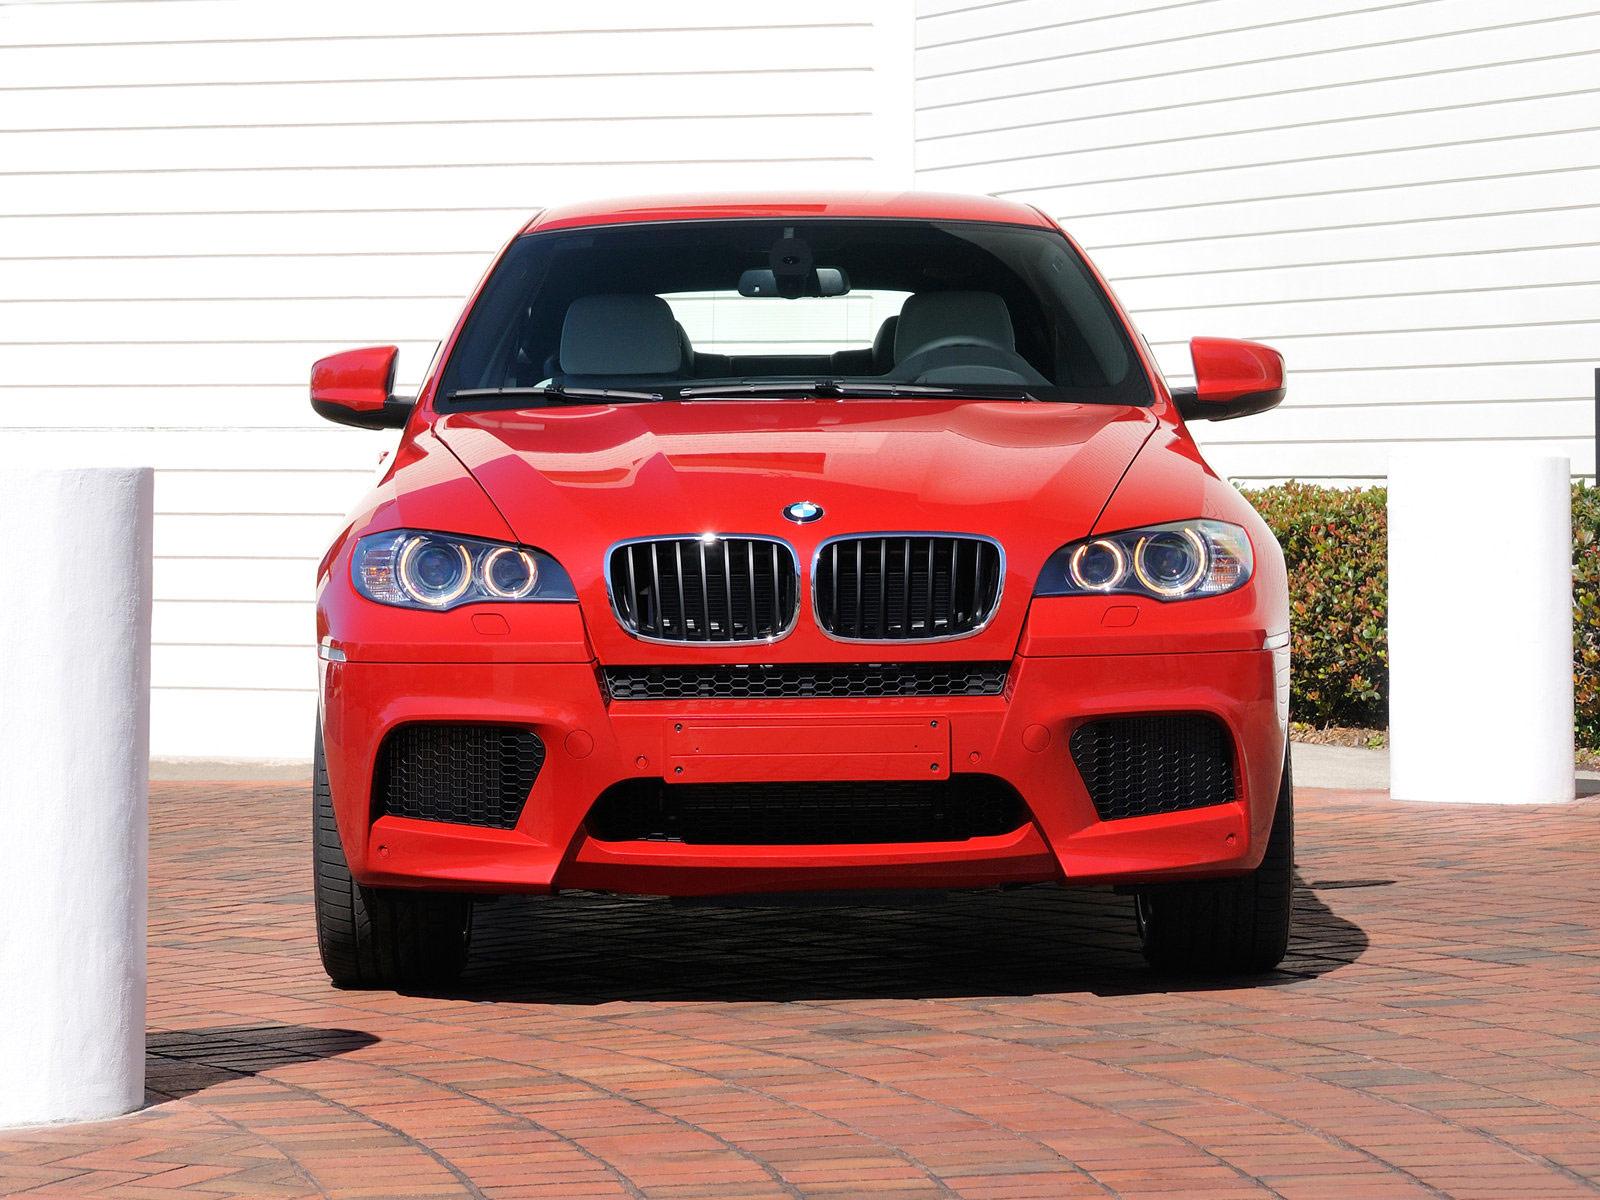 http://1.bp.blogspot.com/_DEP49tusZwg/TNqfPLMIQdI/AAAAAAAACUM/gt9bYFgfMYw/s1600/BMW-X6_M_2010_08.jpg